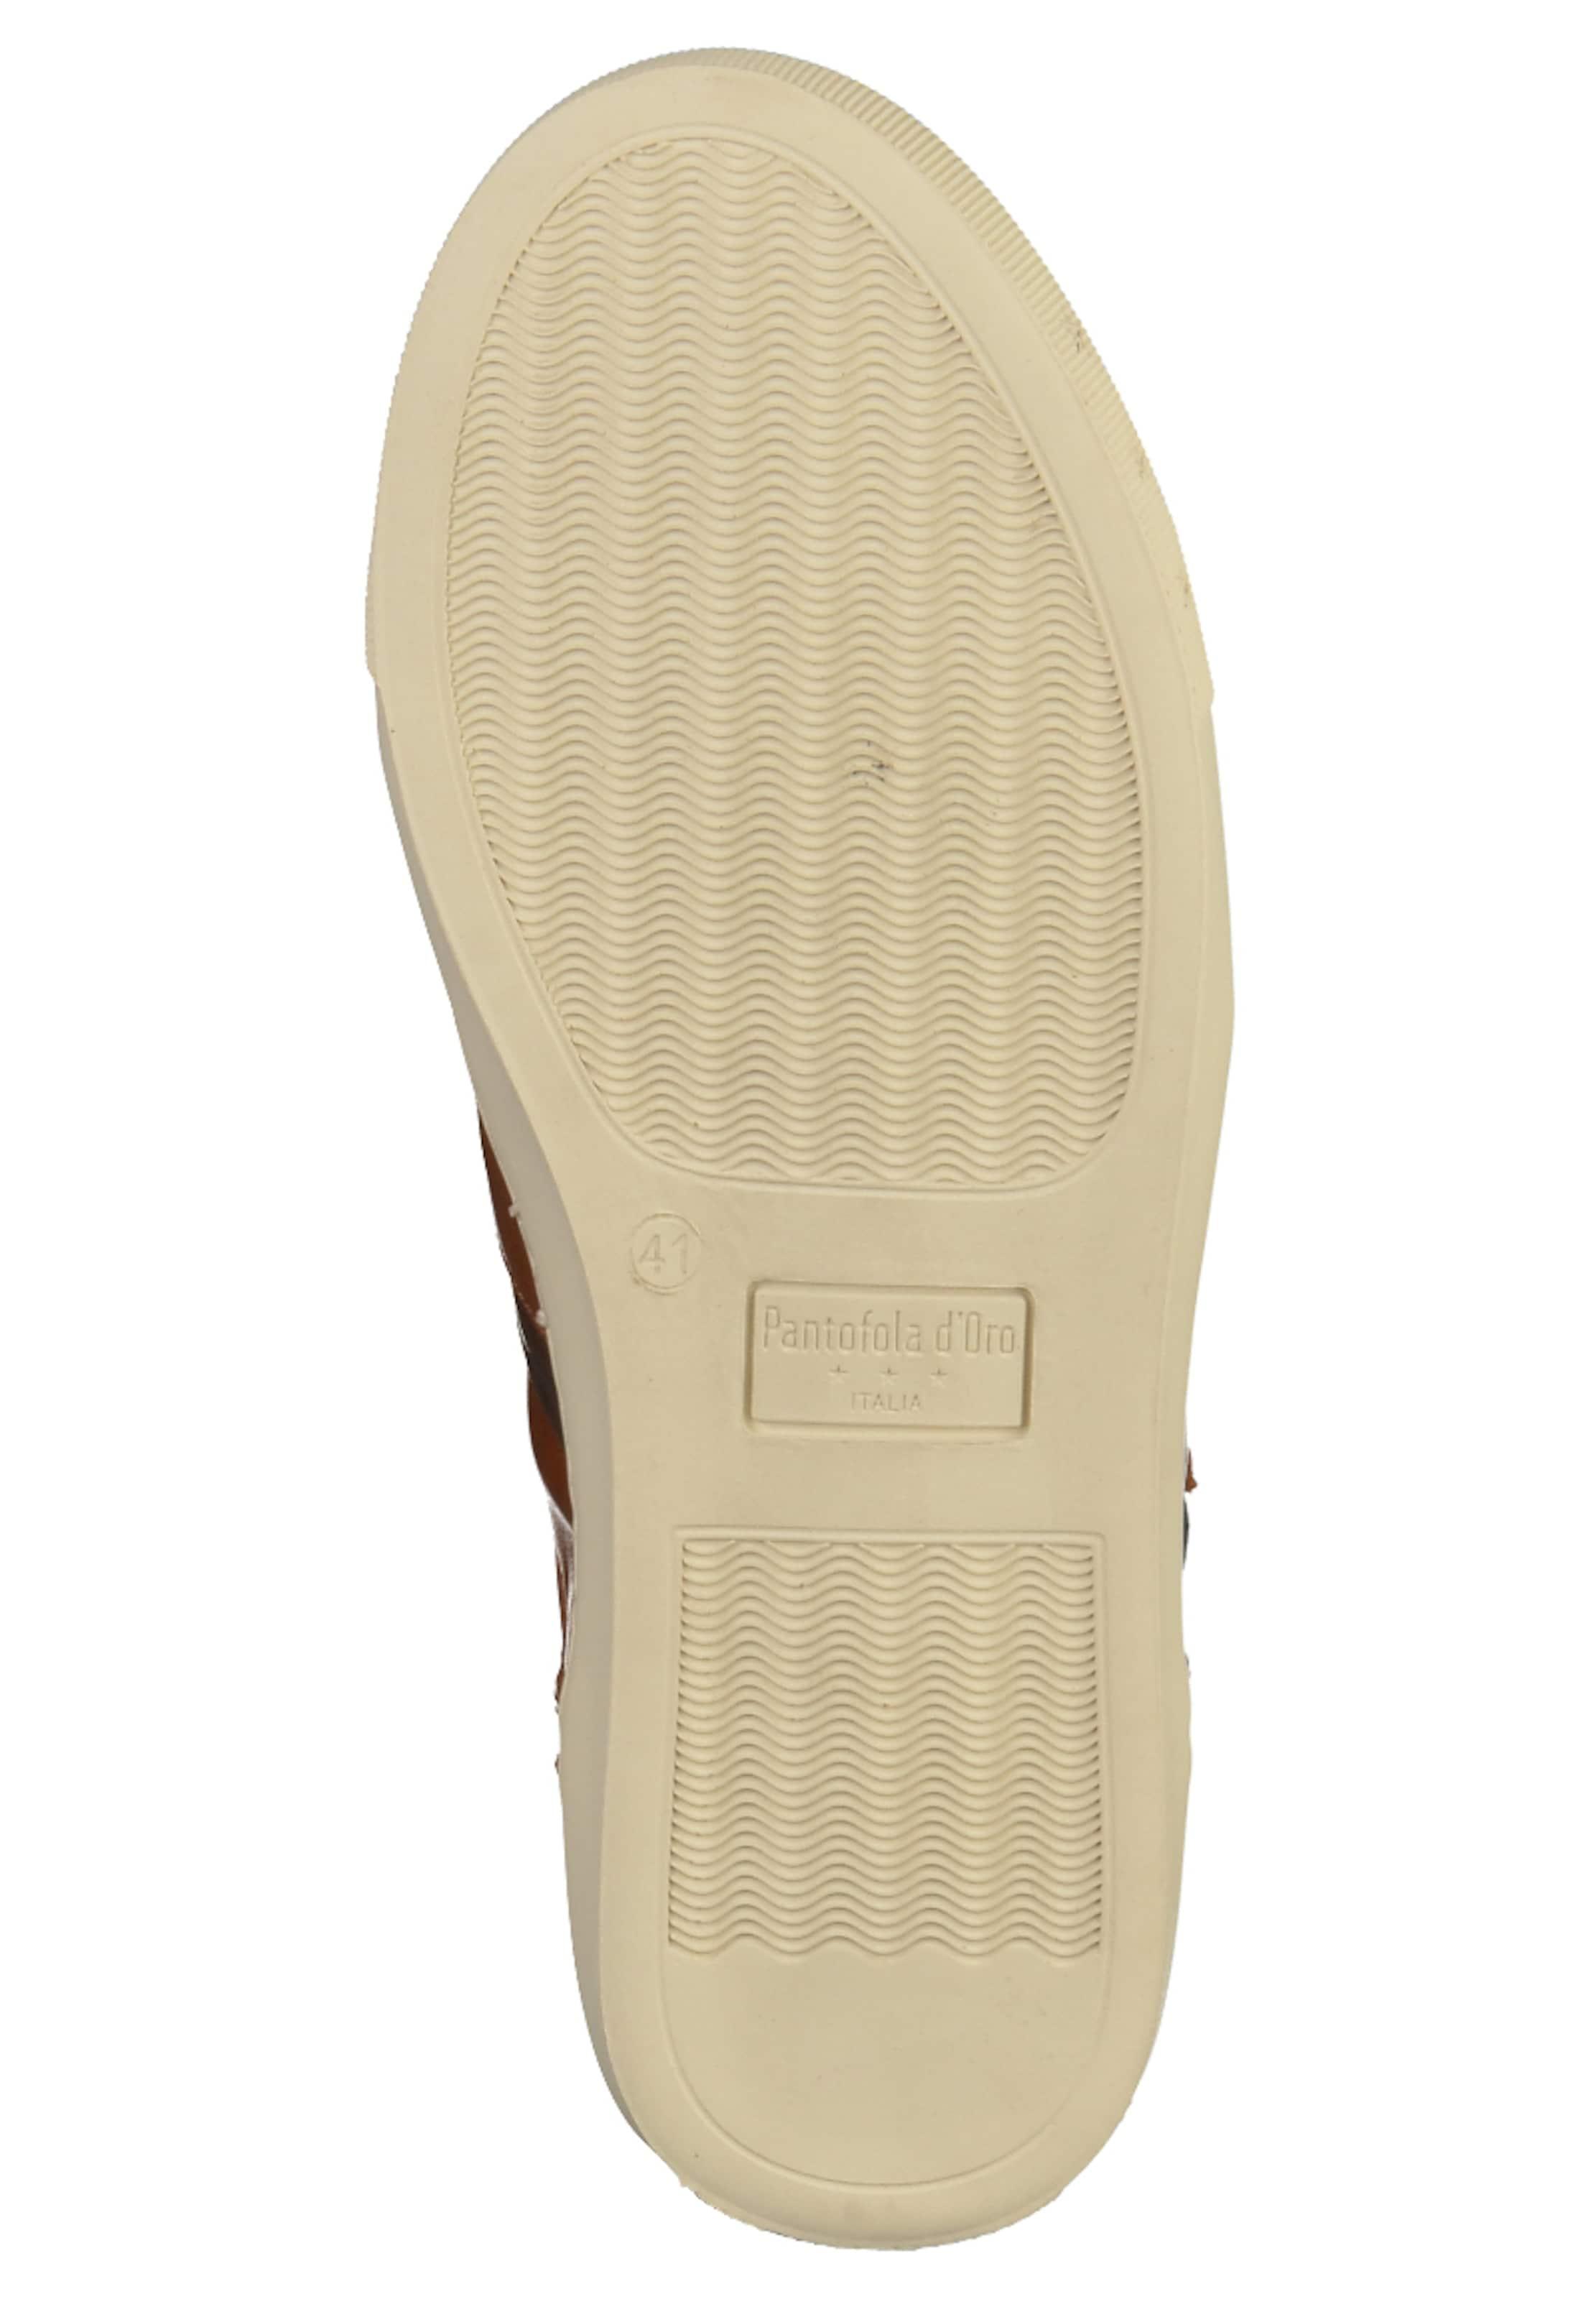 Pantofola Sneaker In Weiß D'oro DunkelblauBraun 34Rj5ALq